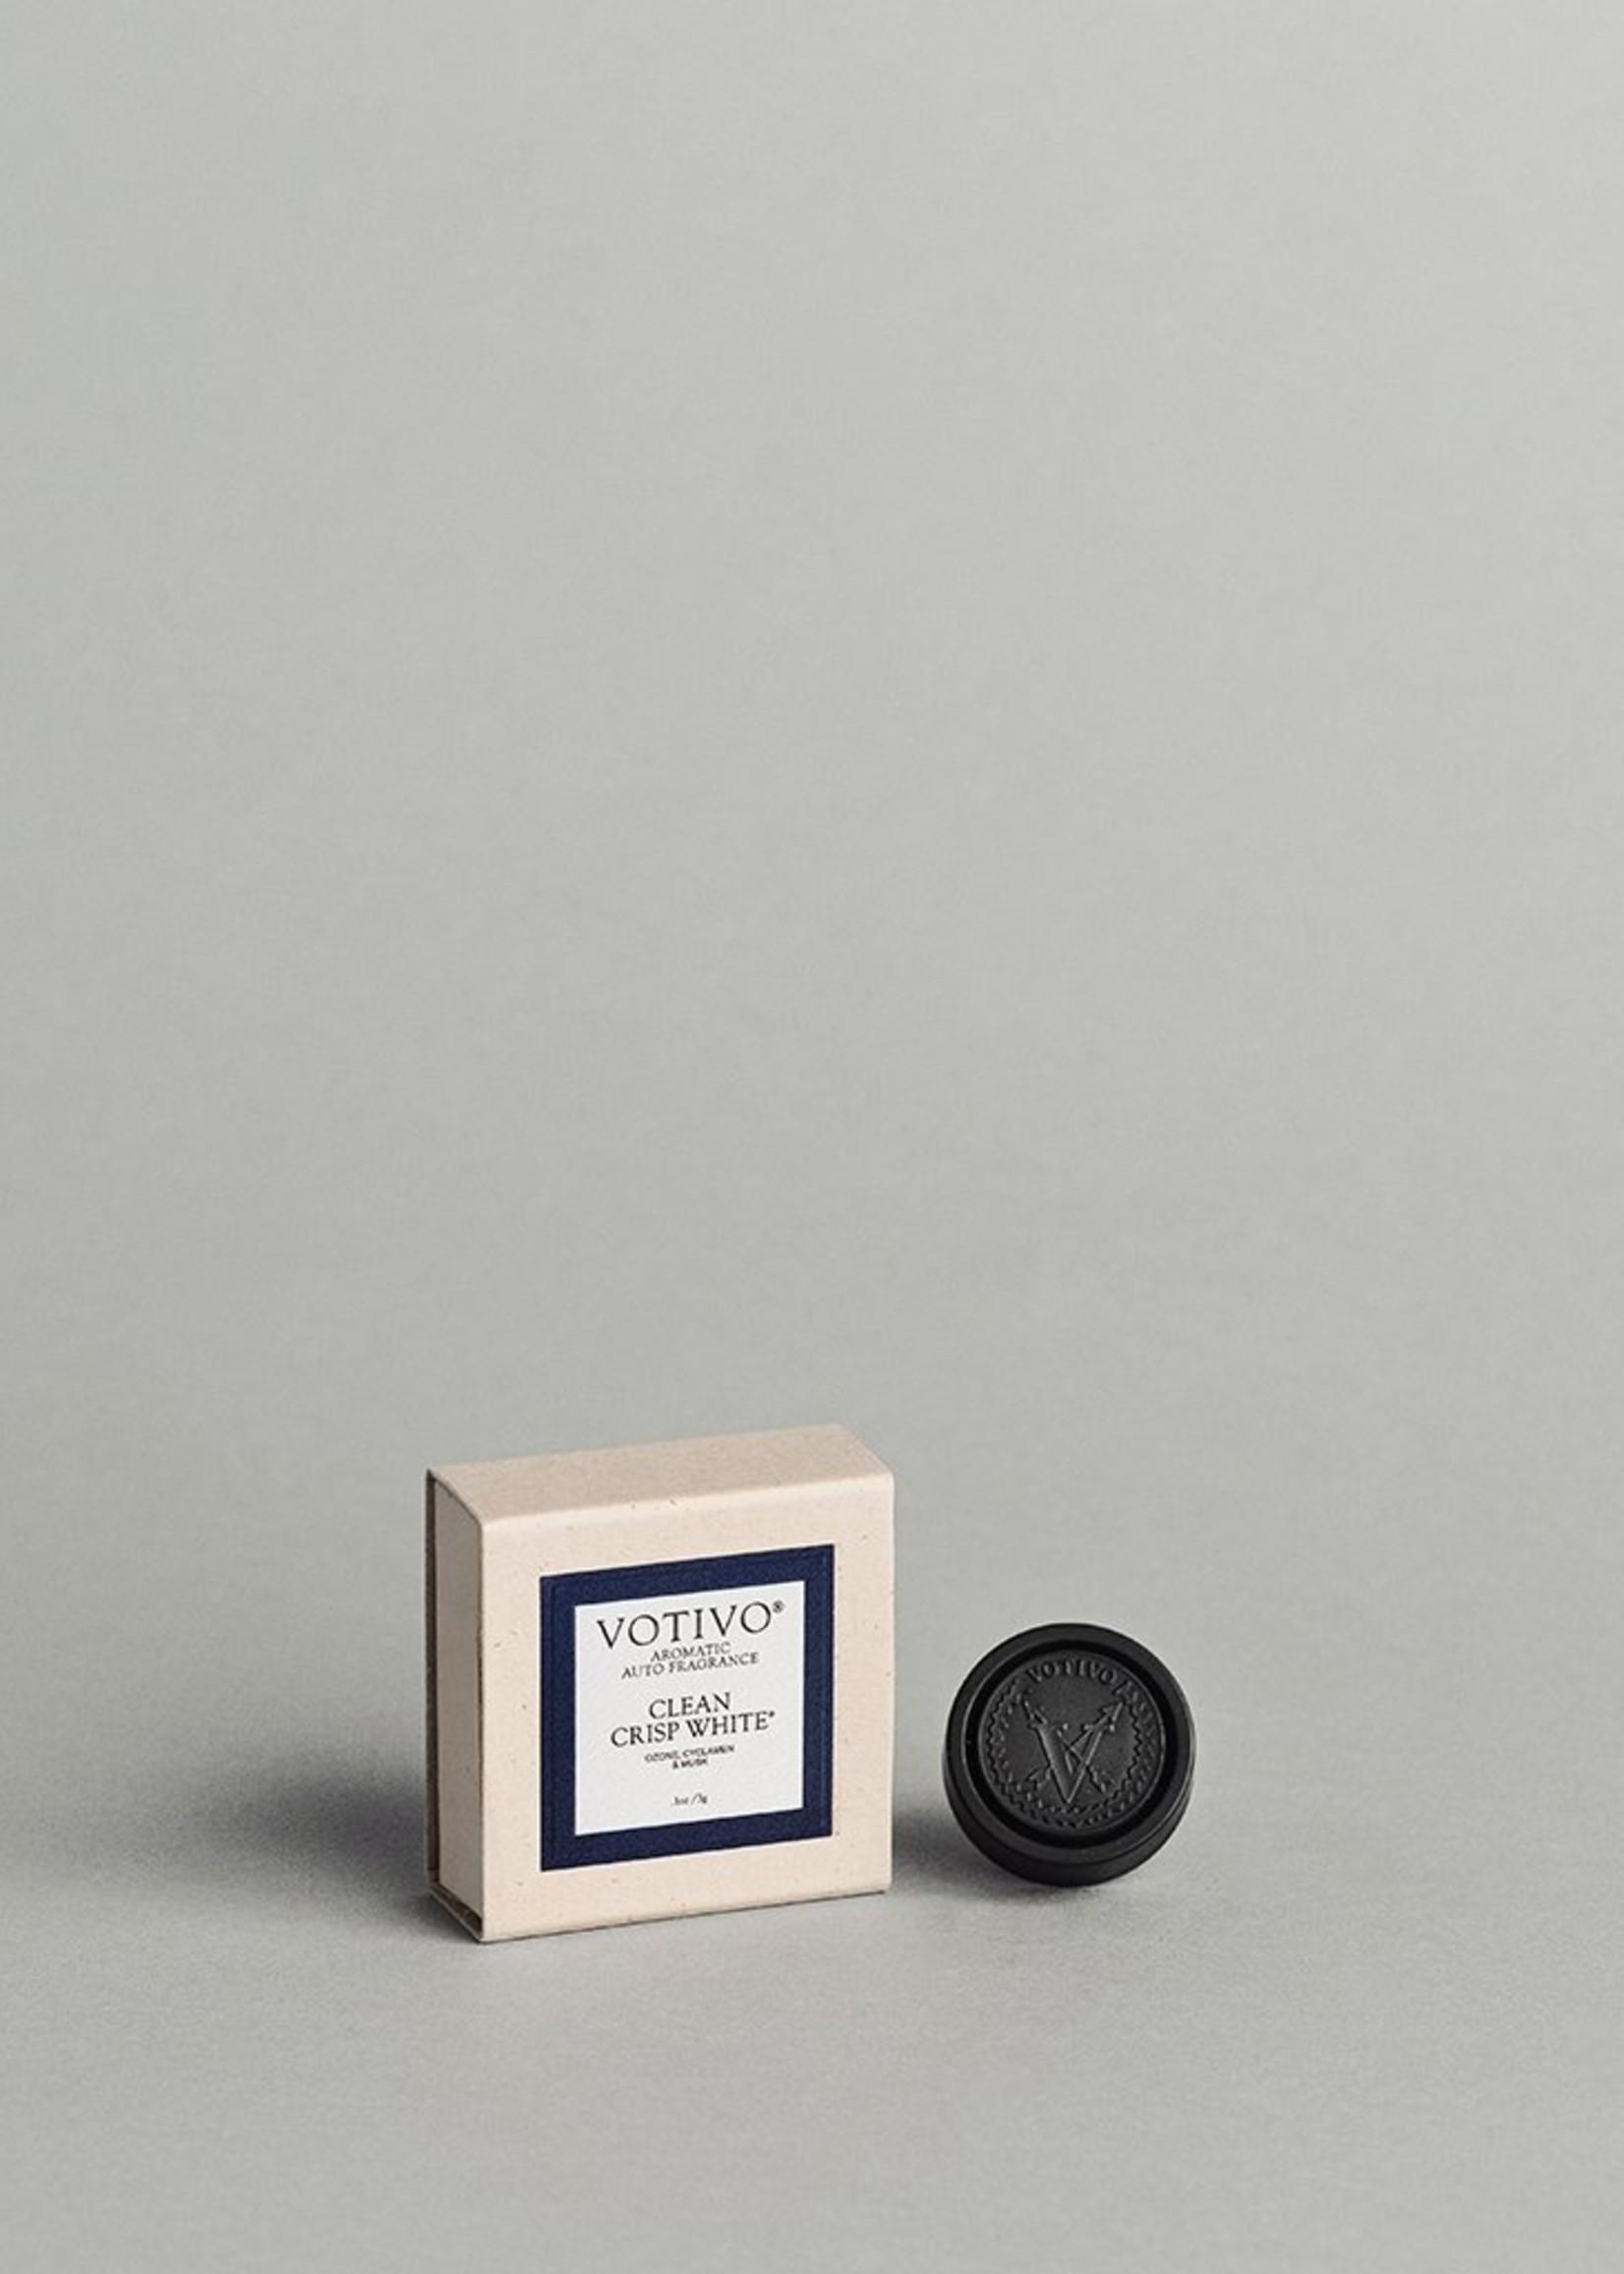 Votivo Aromatic Auto Fragrance